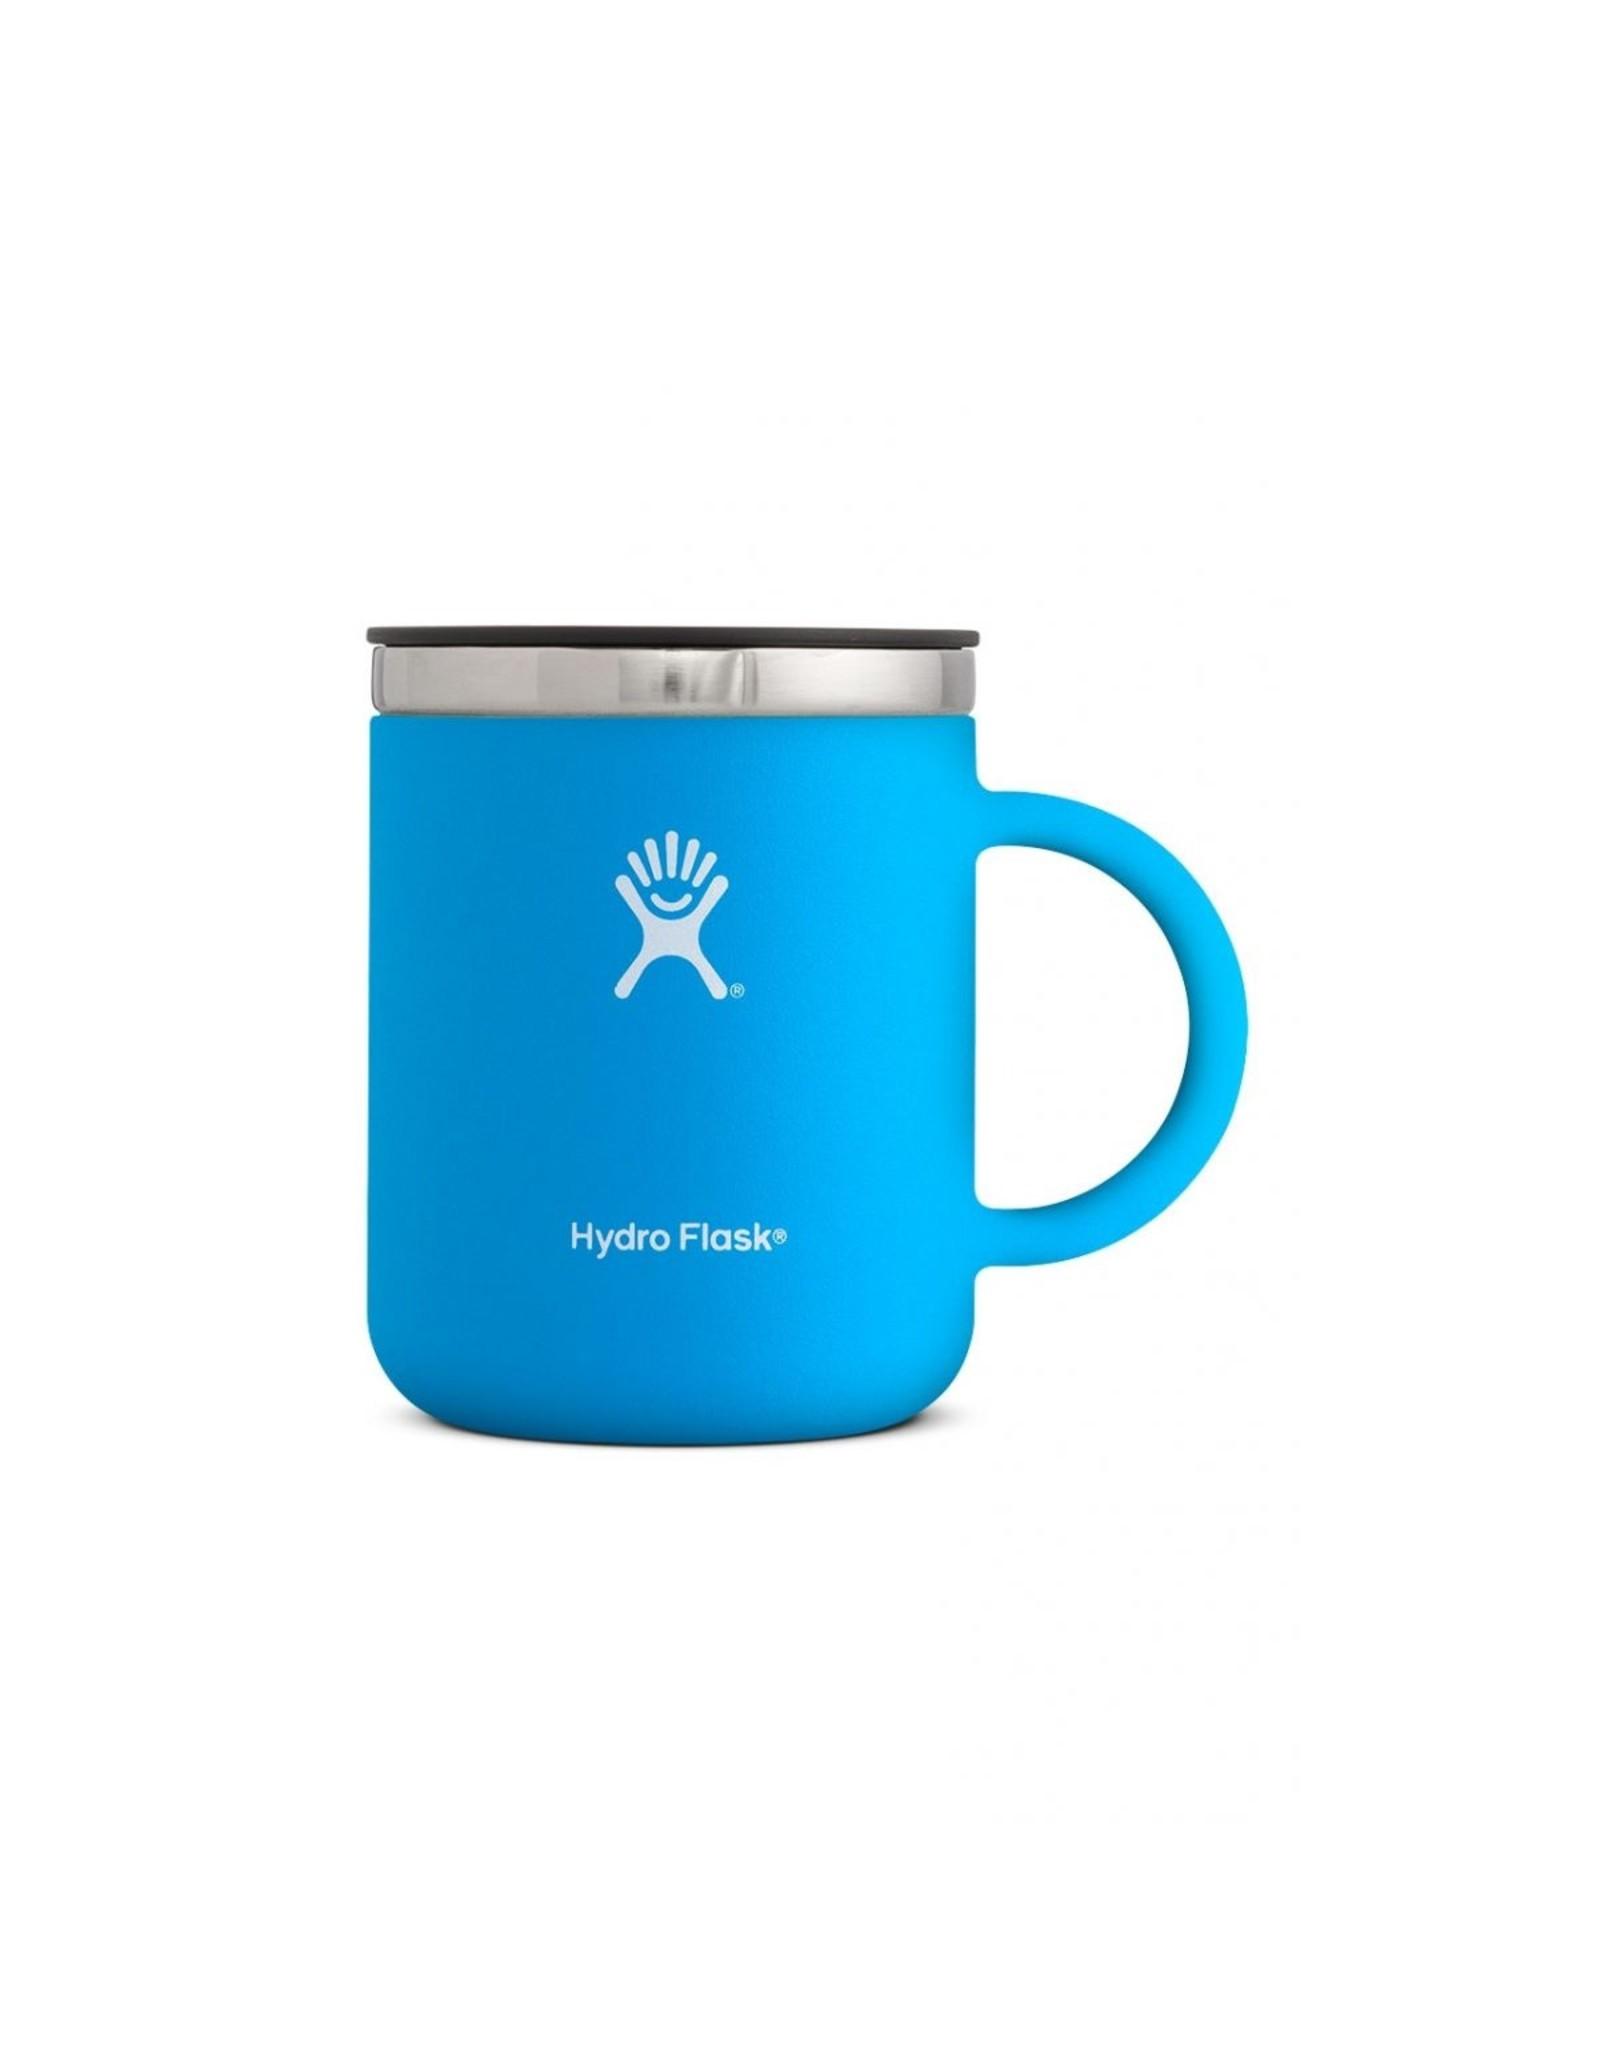 HYDRO FLASK HYDRO FLASK 12OZ COFFEE MUG-PACIFIC